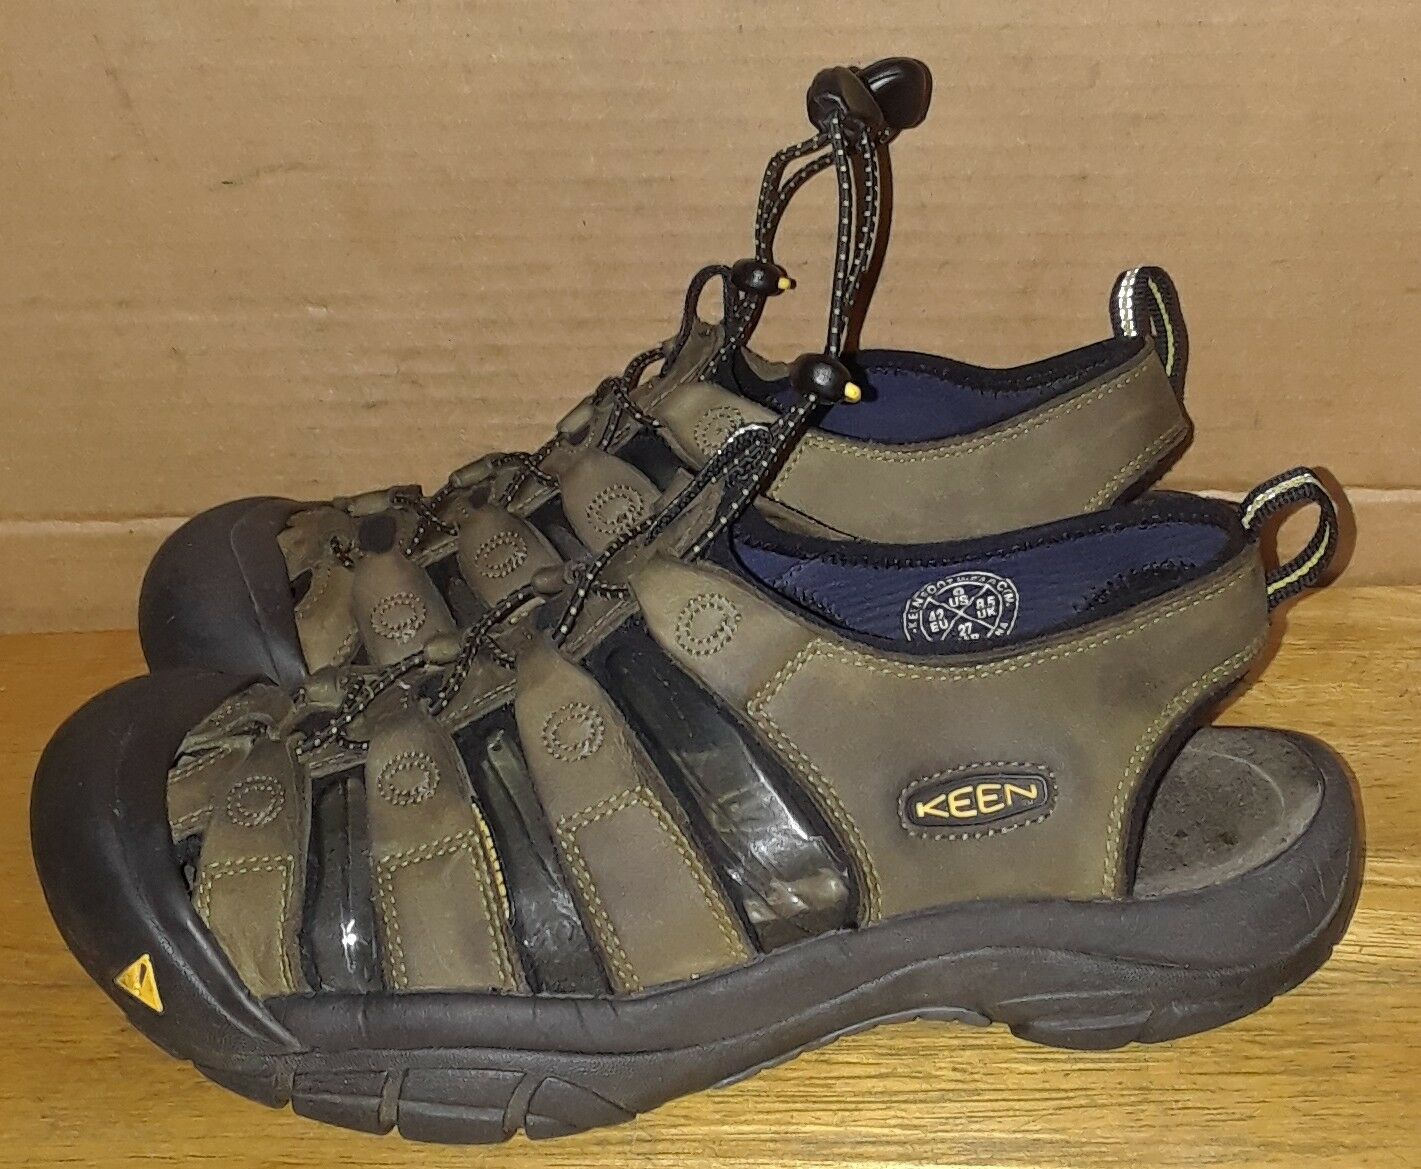 Keen Newport H2 Green Leather Men's Sandals Sandals Sandals Size 9 Hiking Outdoor Walking 78264b